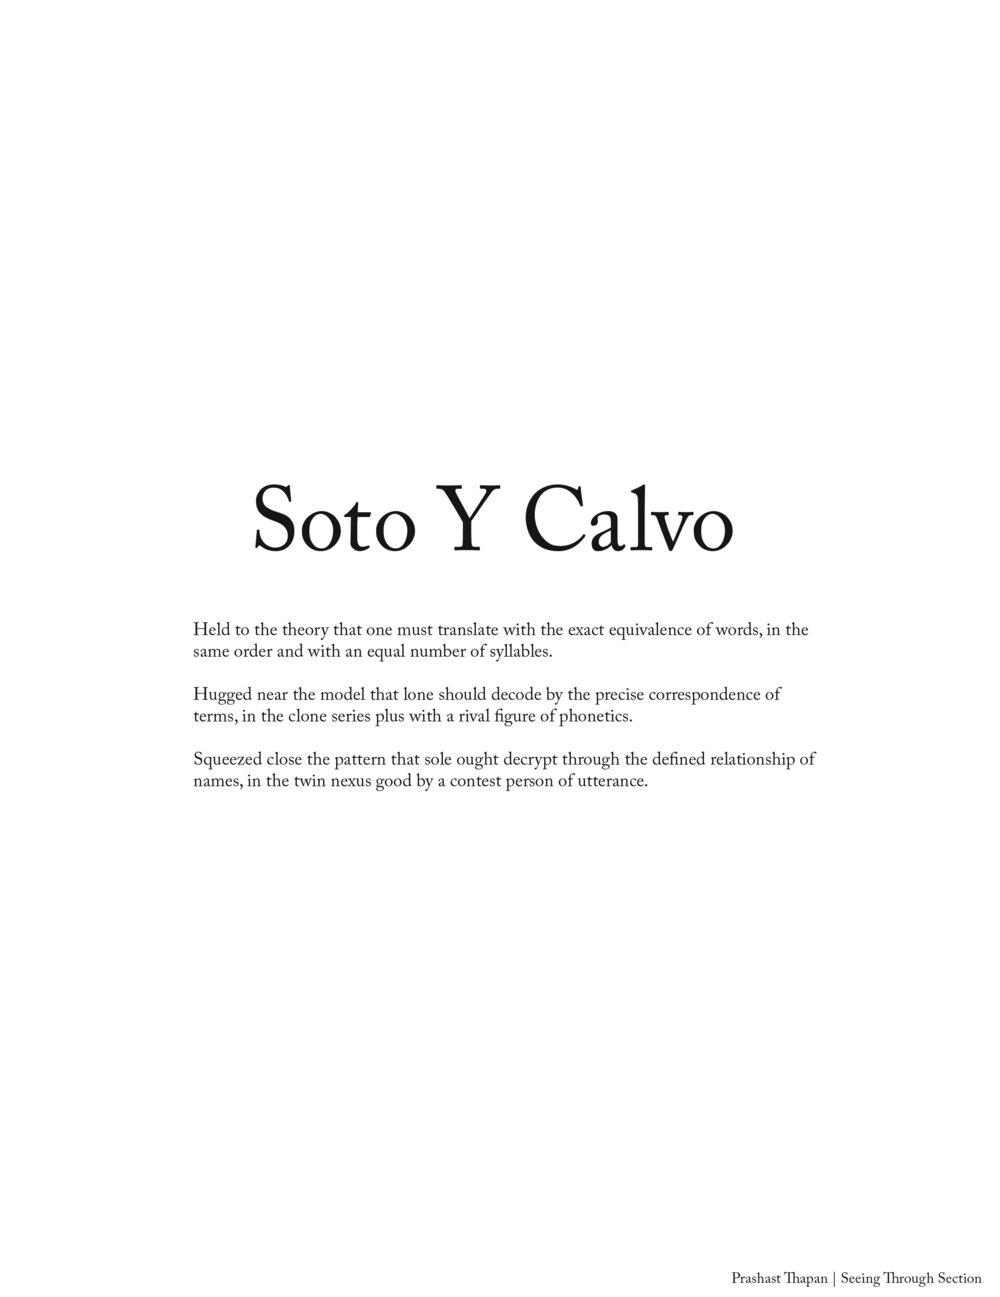 Thapan_Prashast_Soto_Y_Calvo copy.jpg